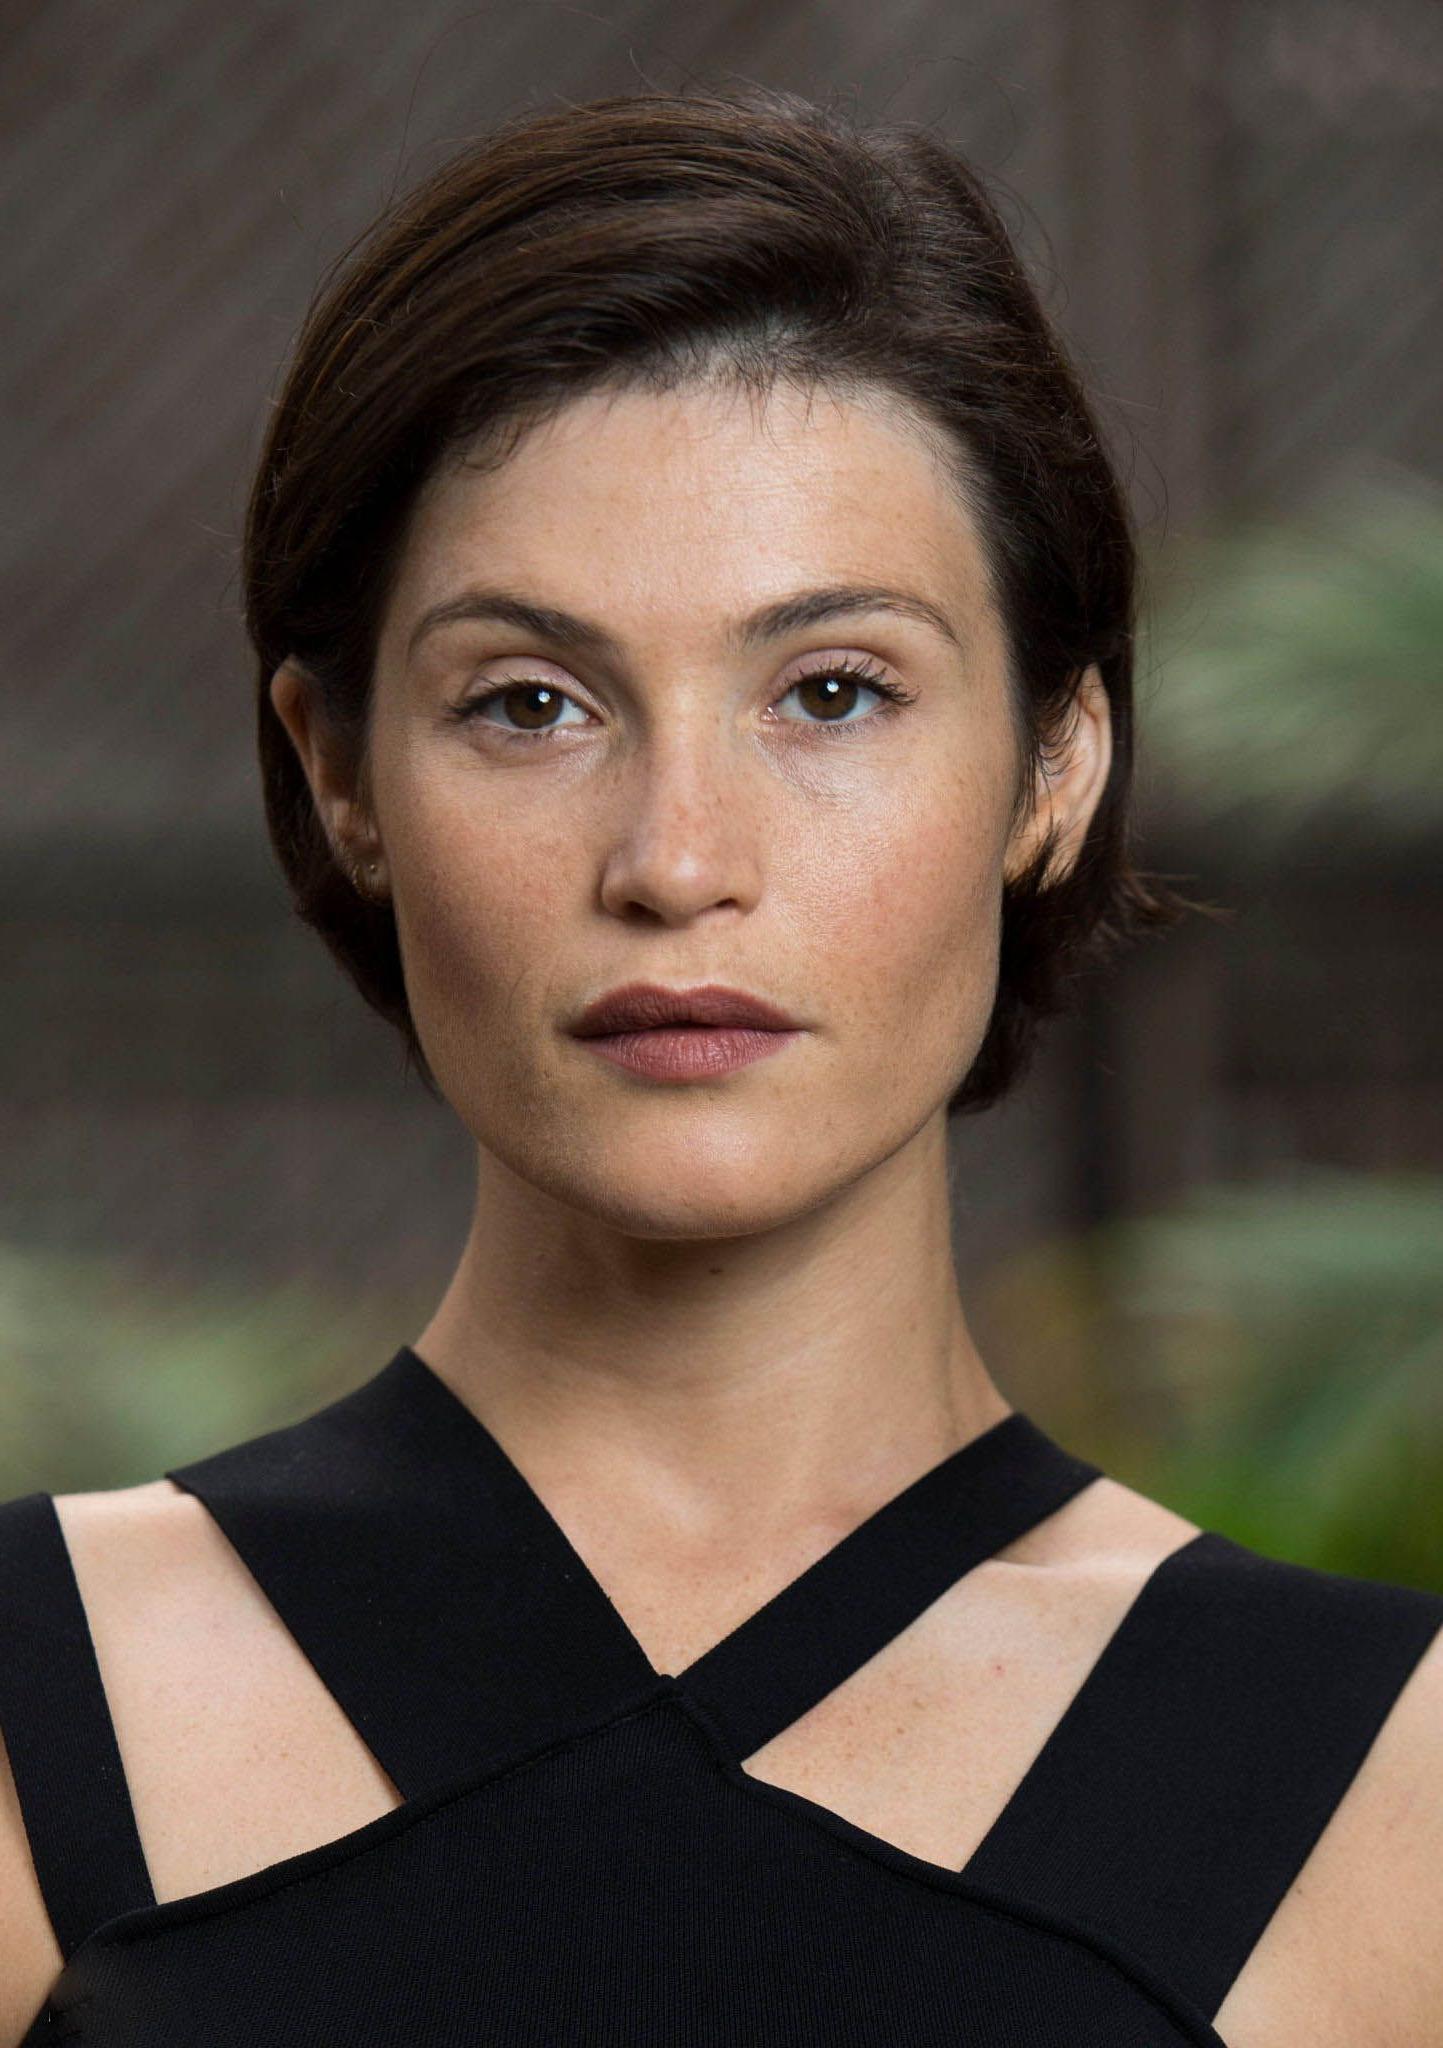 Gemma Arterton '' The Escape '' Portraits At The Toronto Regarding Short Haircuts For High Cheekbones (View 17 of 25)